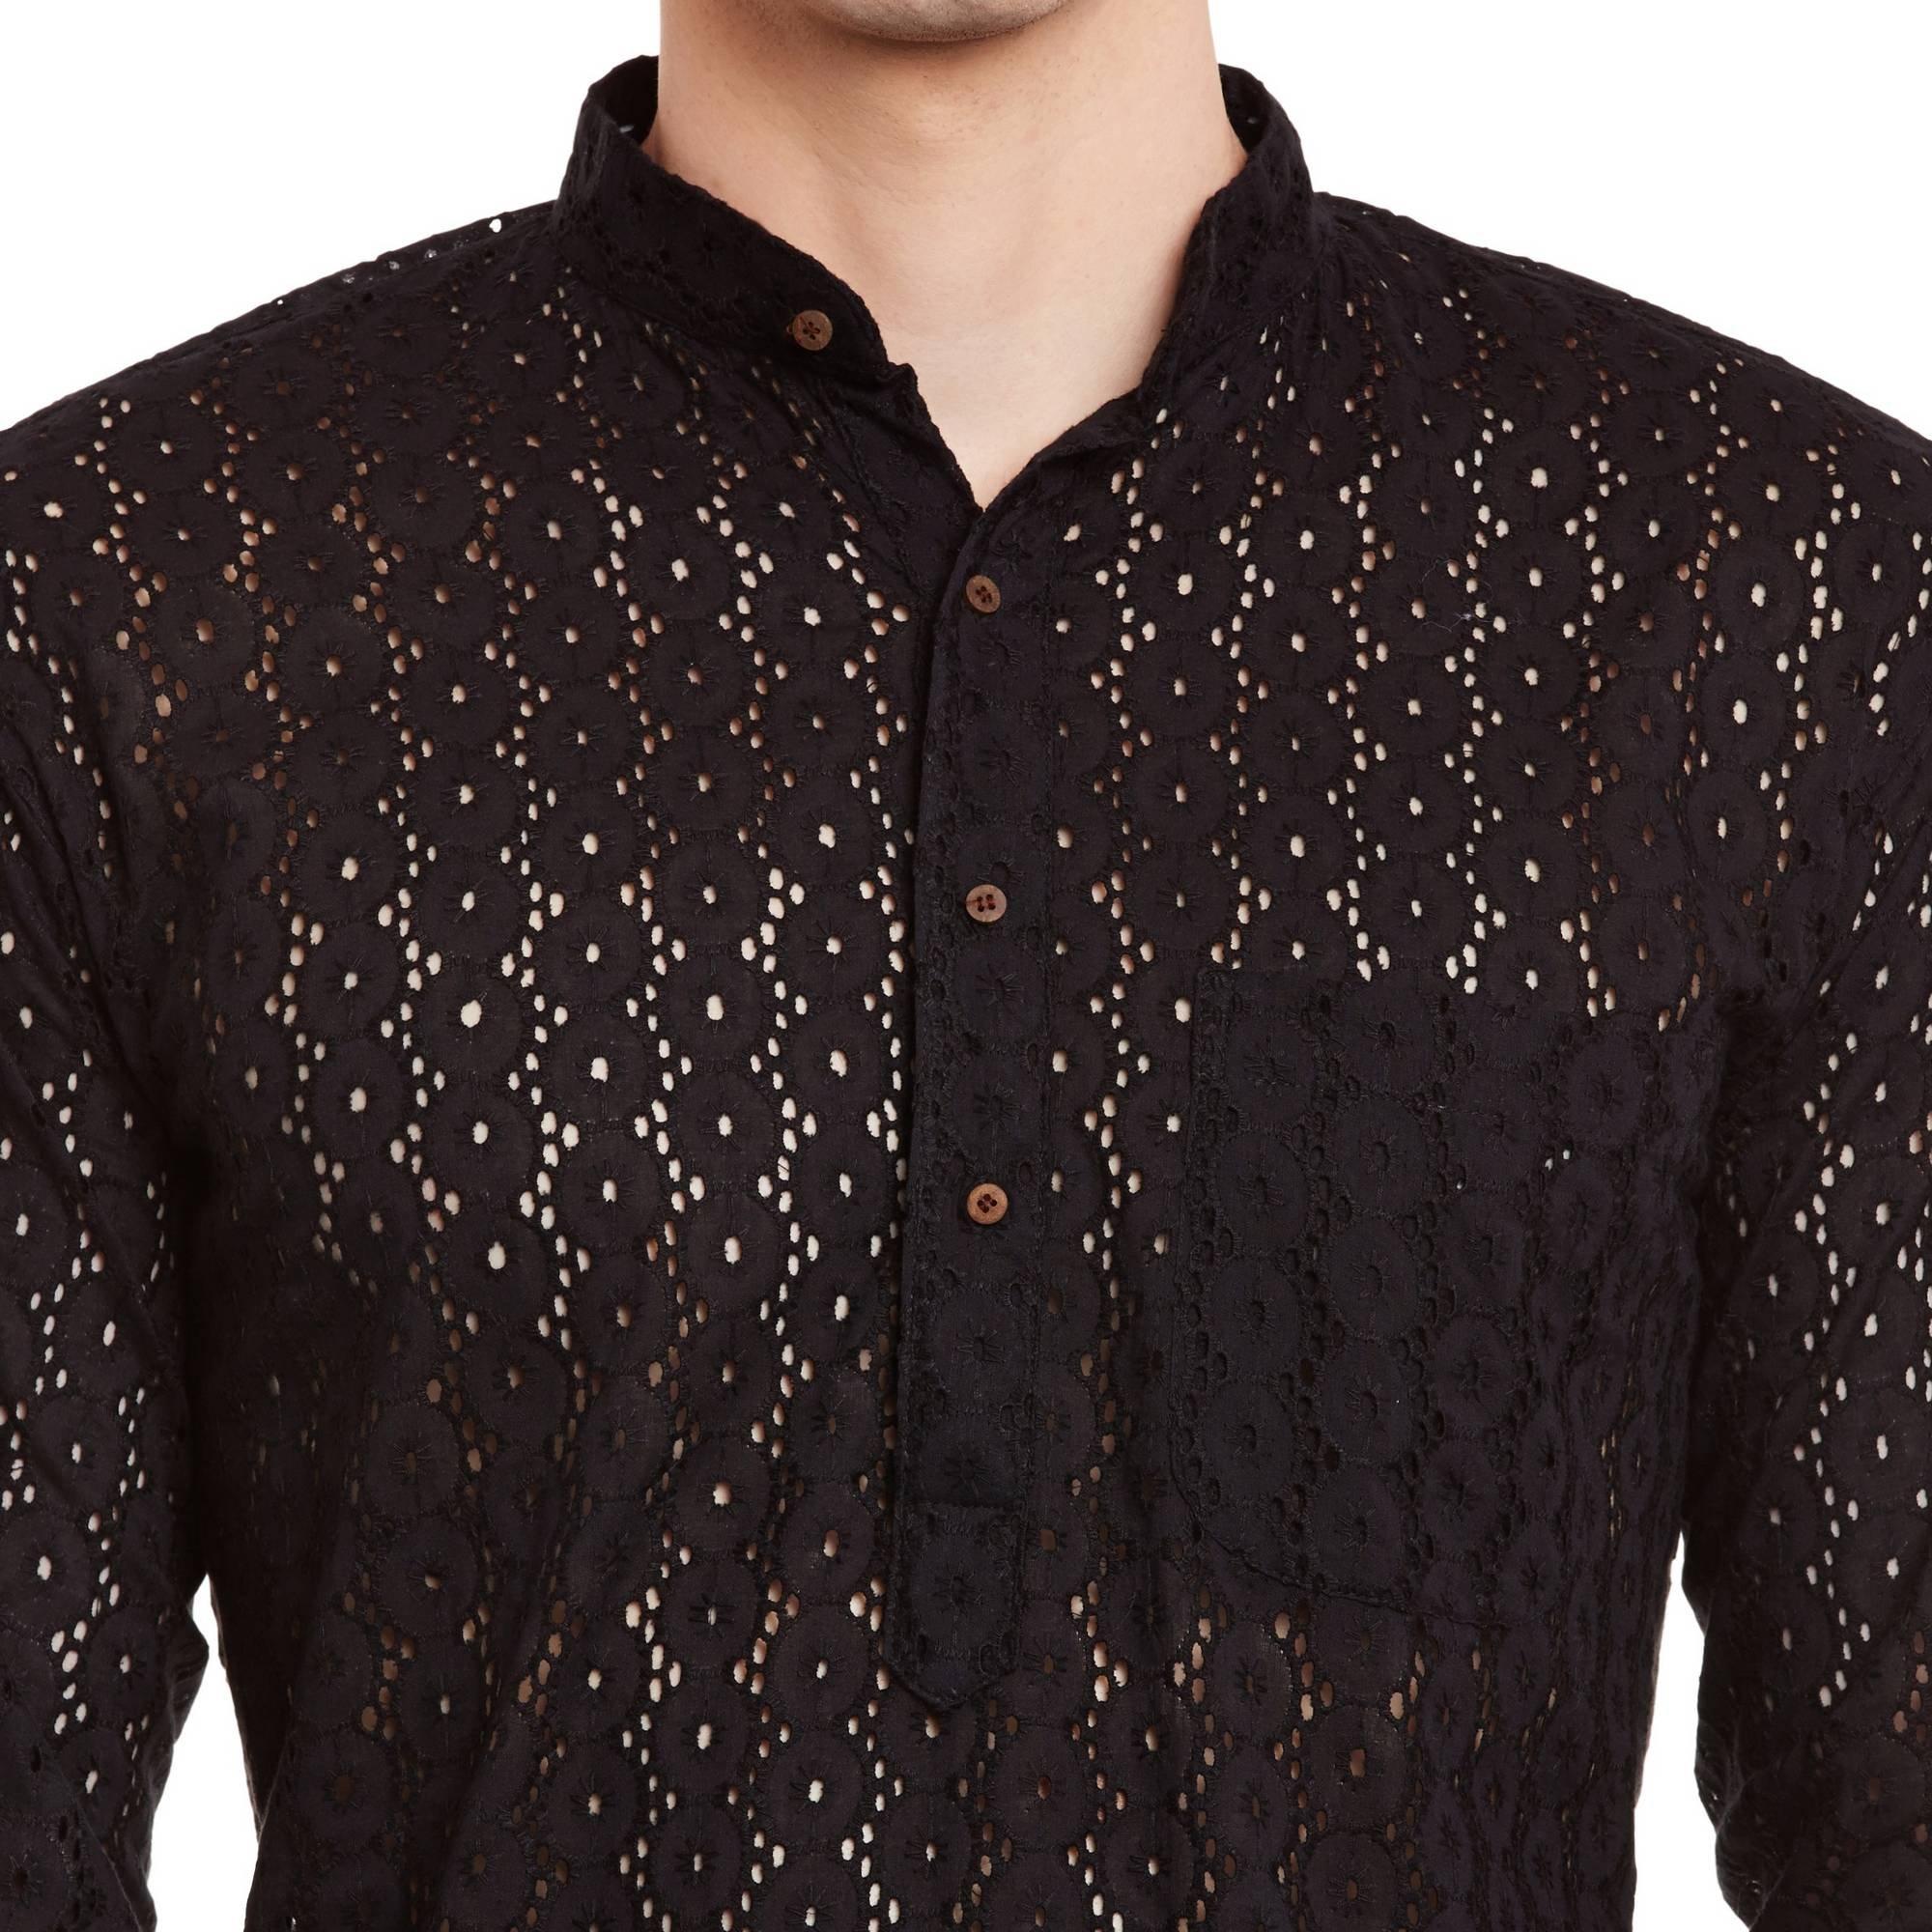 ShalinIndia Mens Embroidered Cutwork Cotton Kurta With Churidar Pajama Trousers Machine Embroidery,Black Chest Size: 40 Inch by ShalinIndia (Image #5)